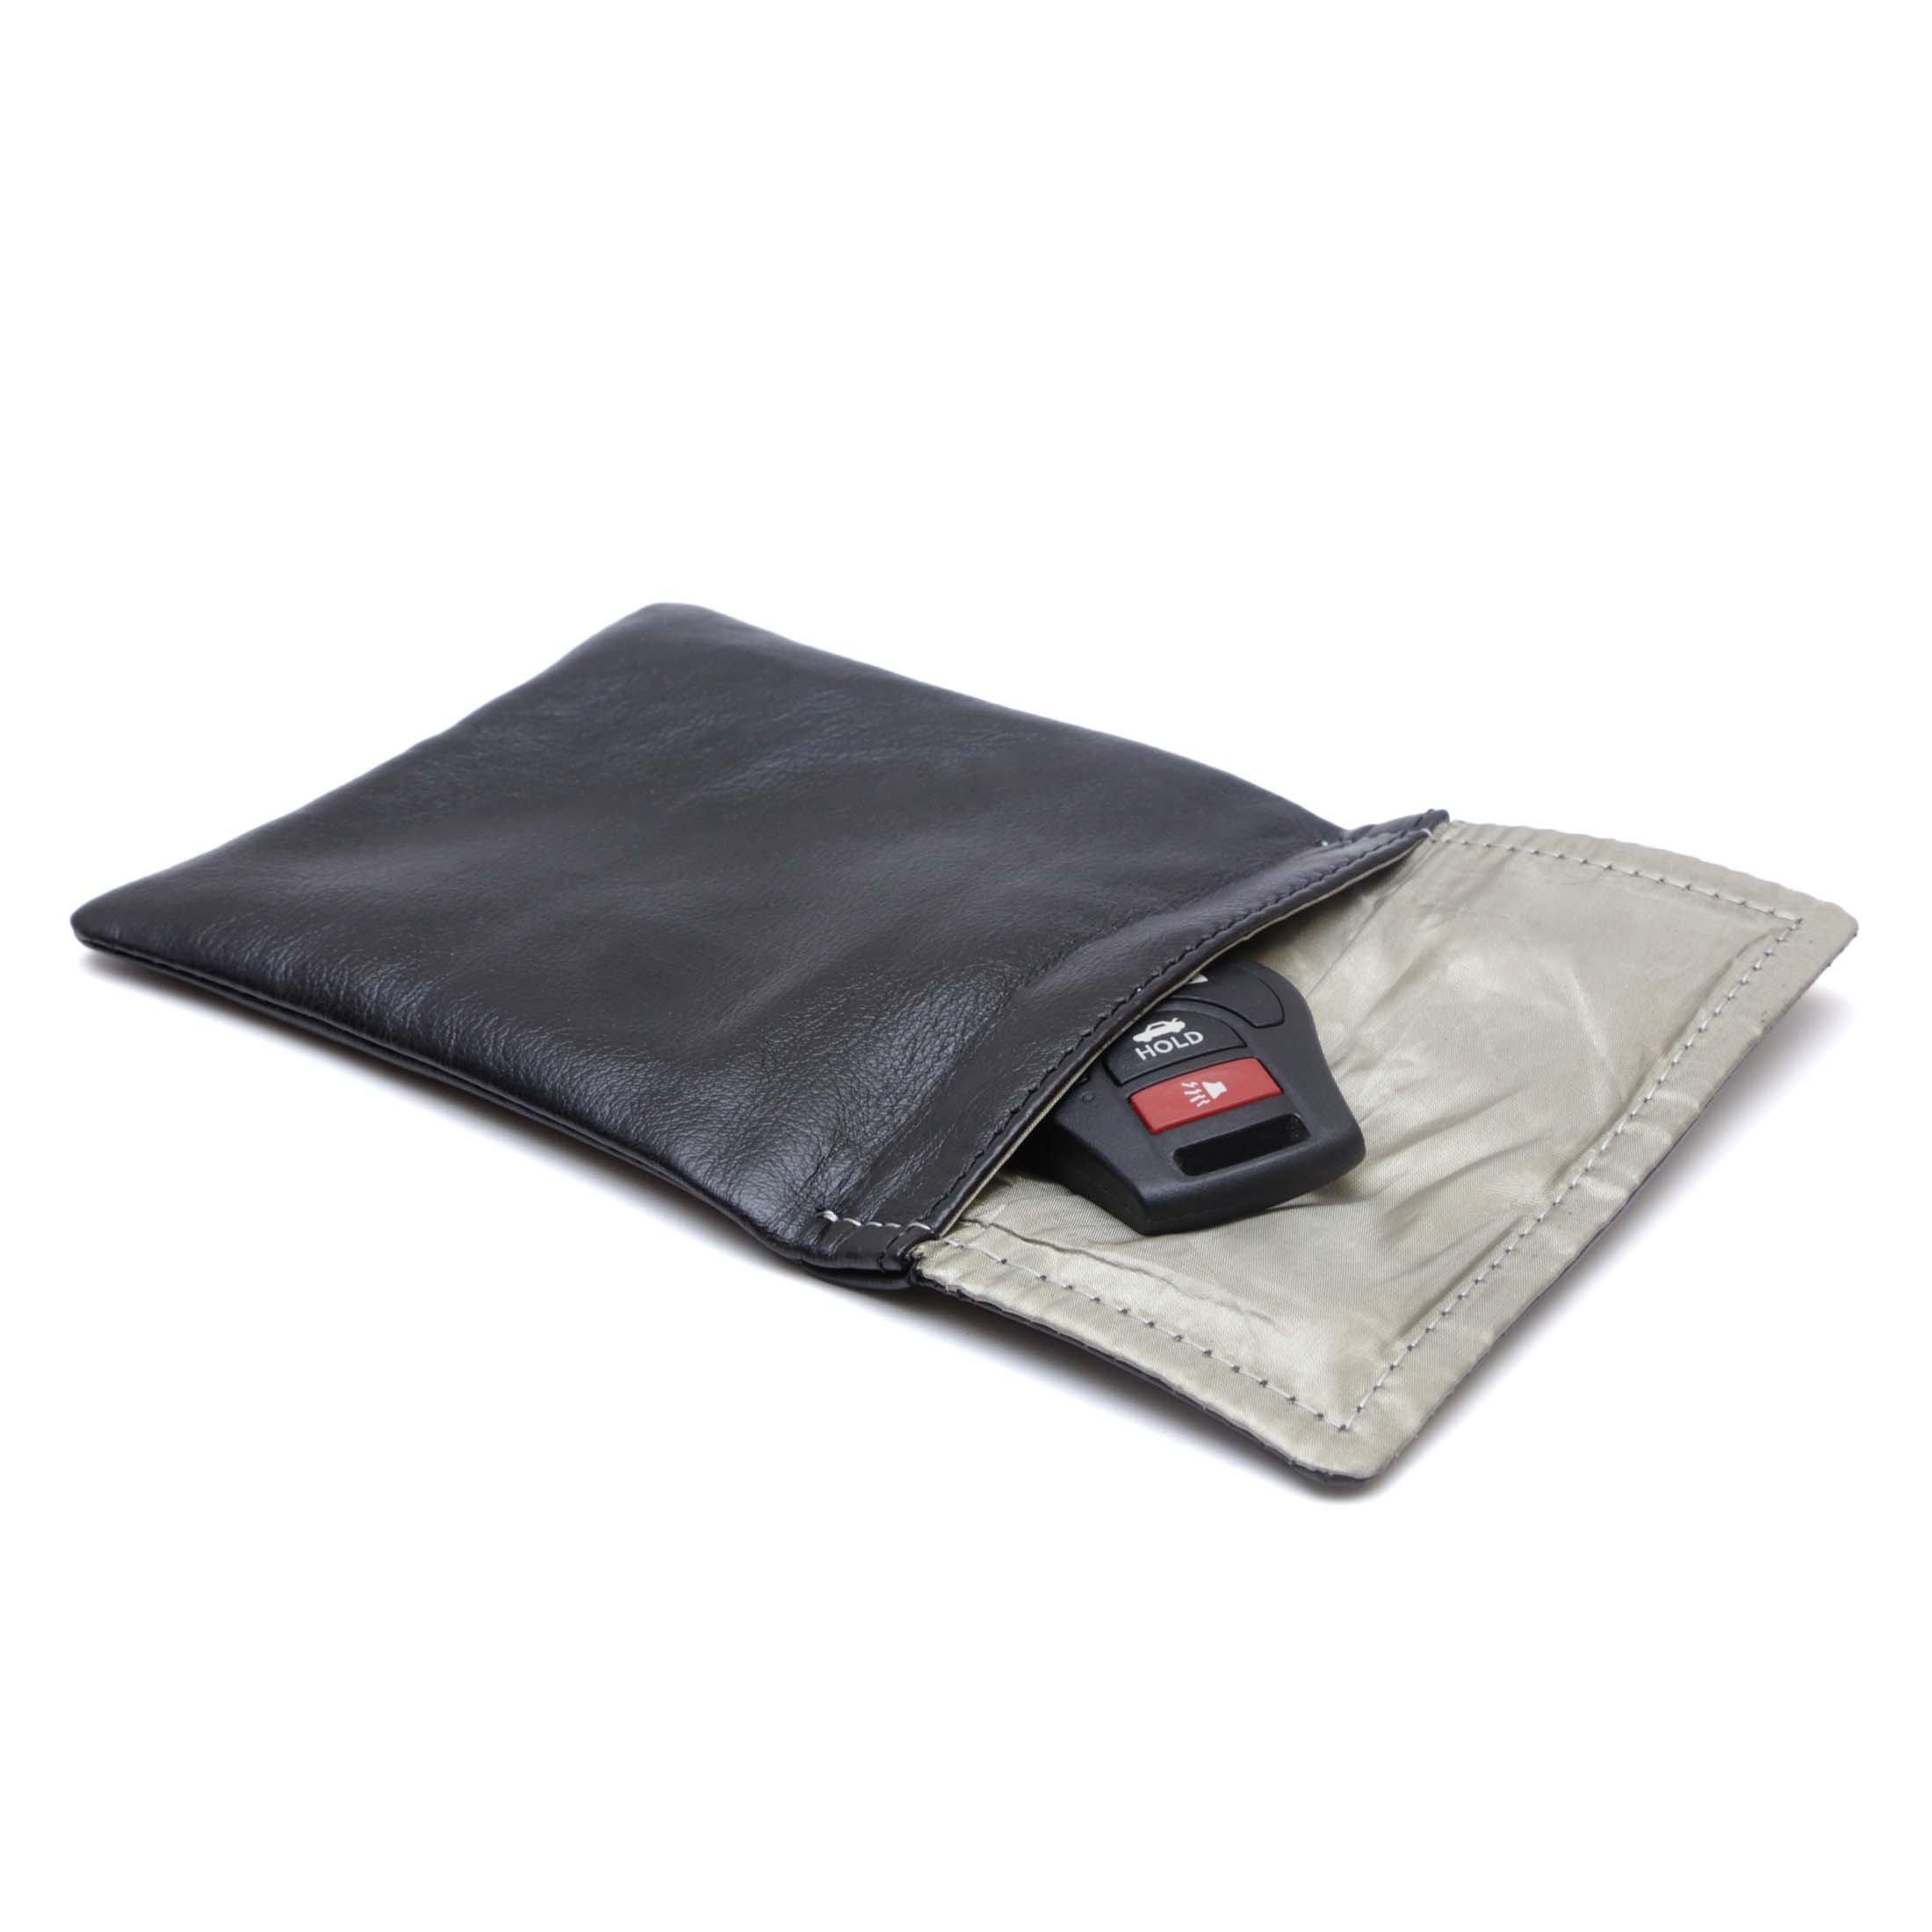 RFID Blocking Real Leather Key Fob Pocket - RFID Blocking Holder Anti-Hacking Security Bag for Car Key Fob - Signal Blocking (Black)